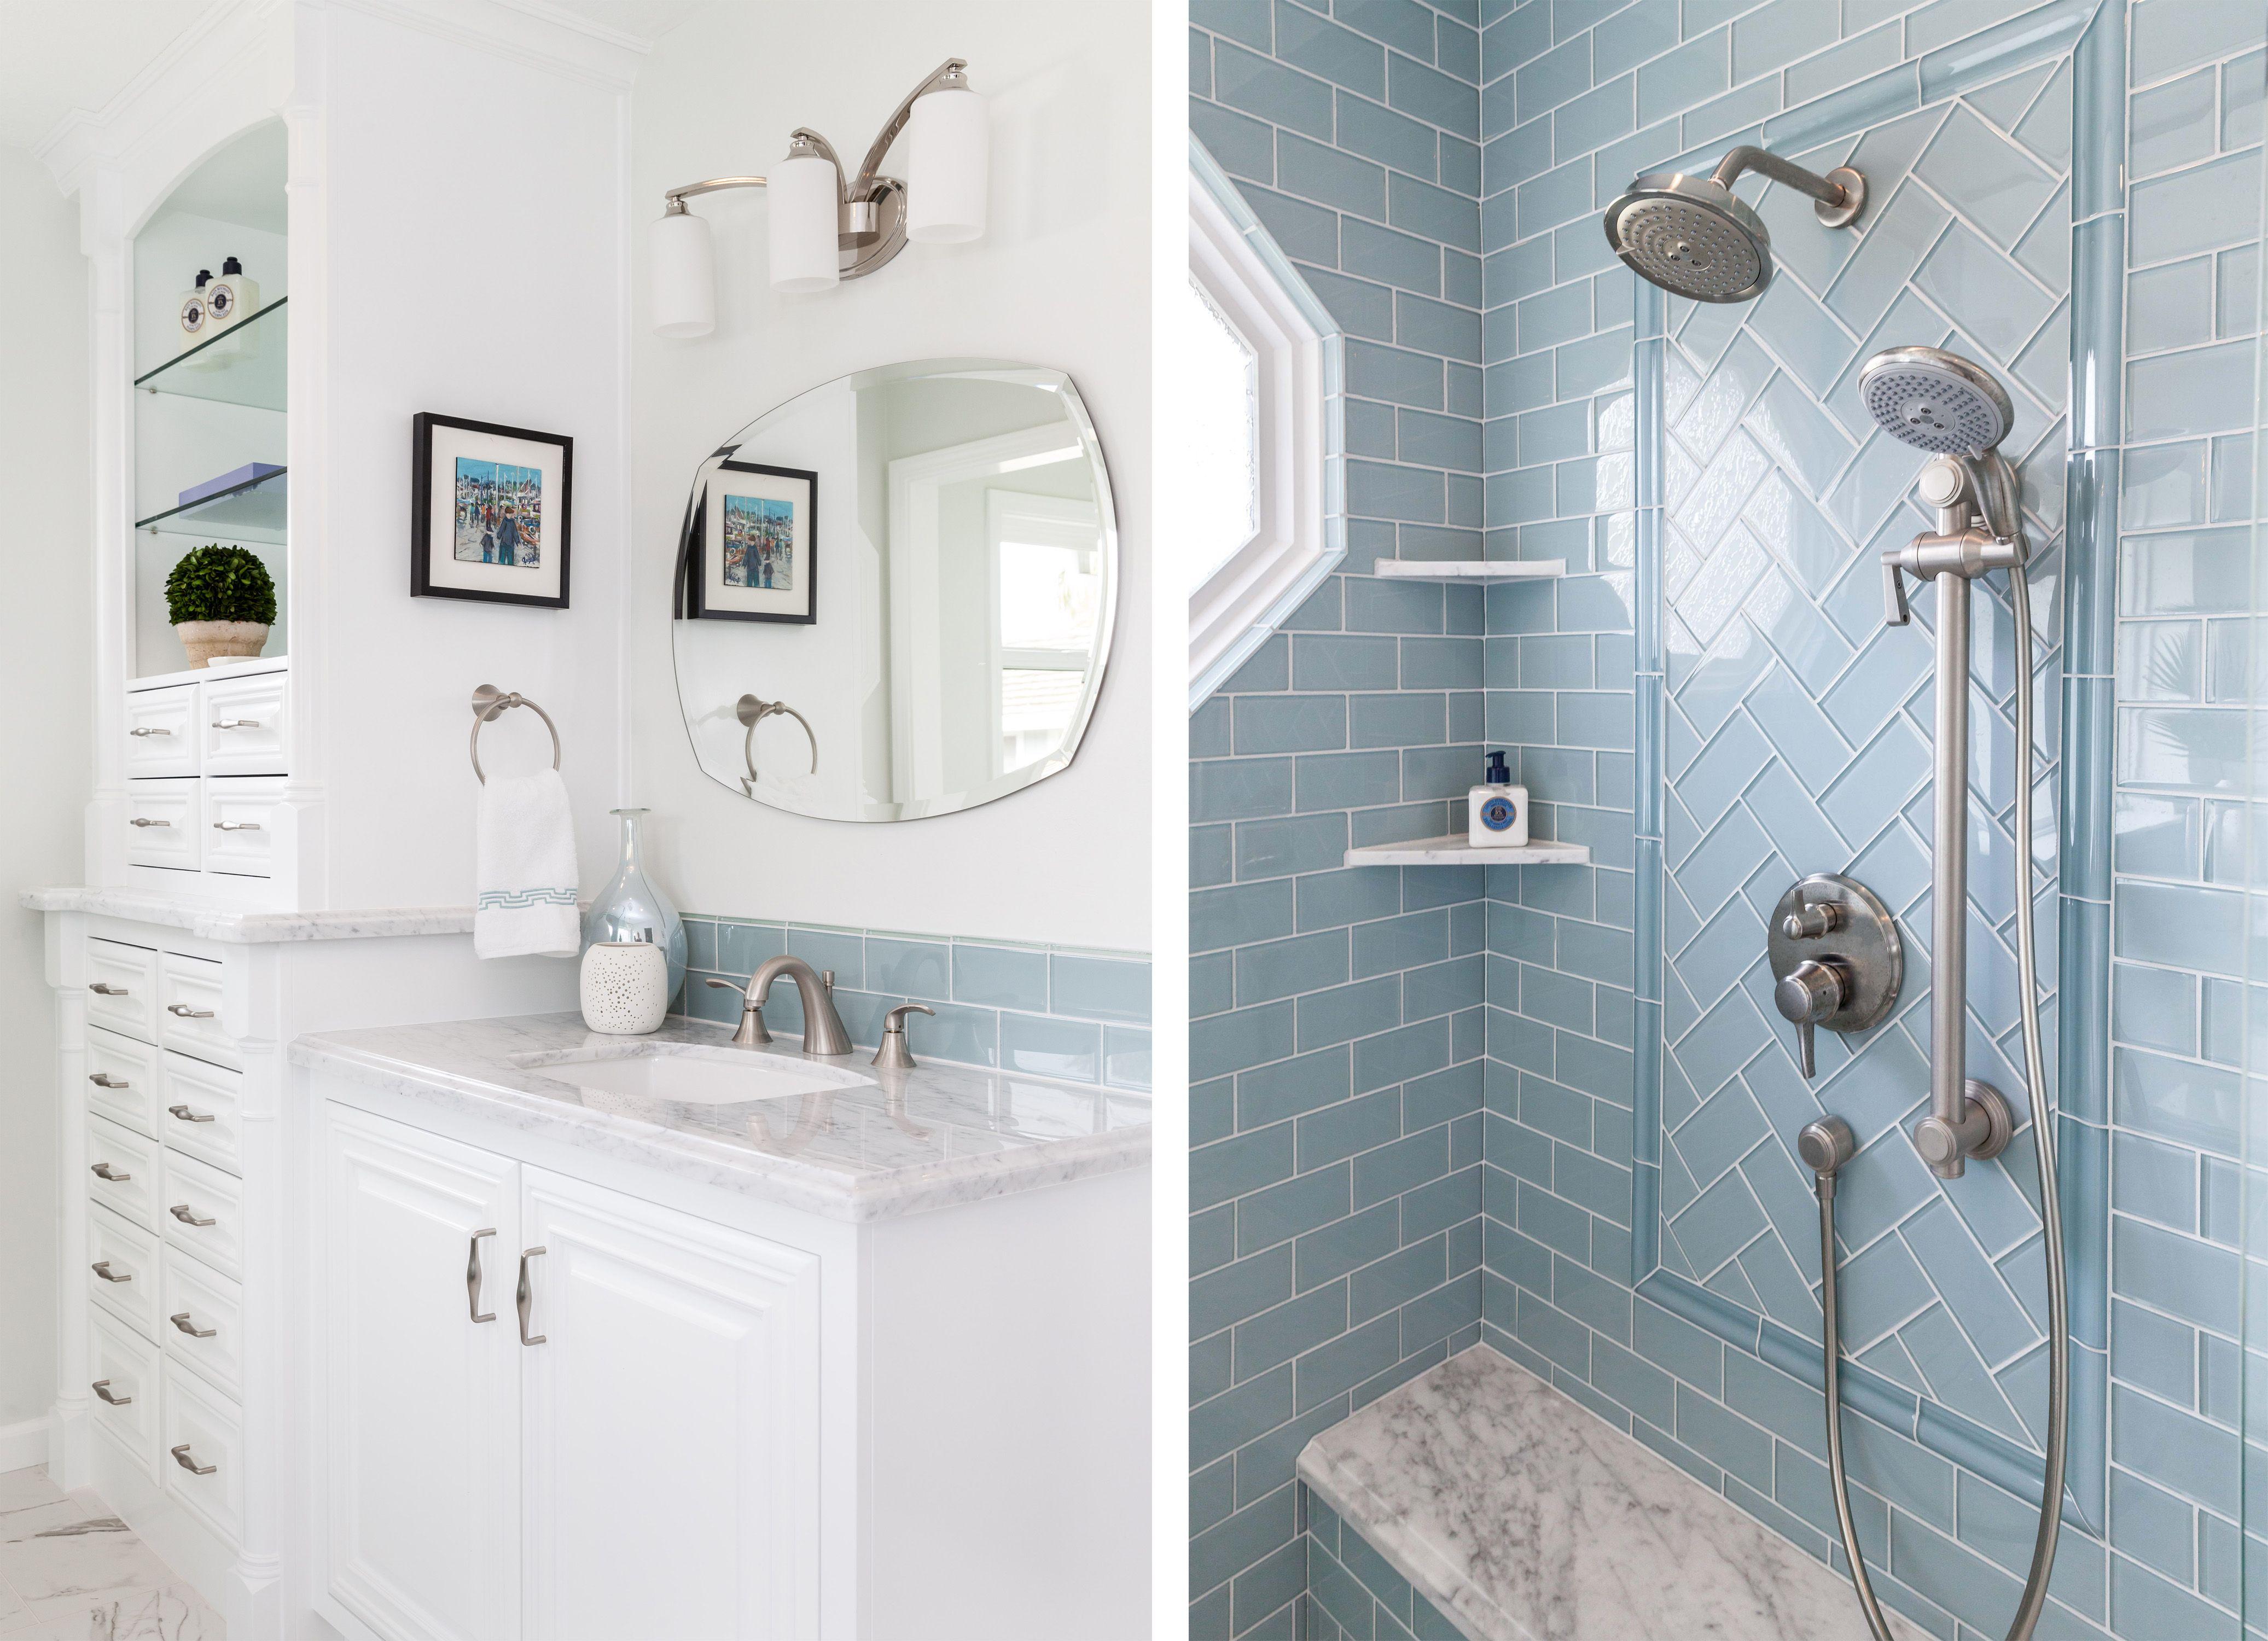 Glamorous Glass Ensuite - Rebecca Ward Design Master Bath with glass ...